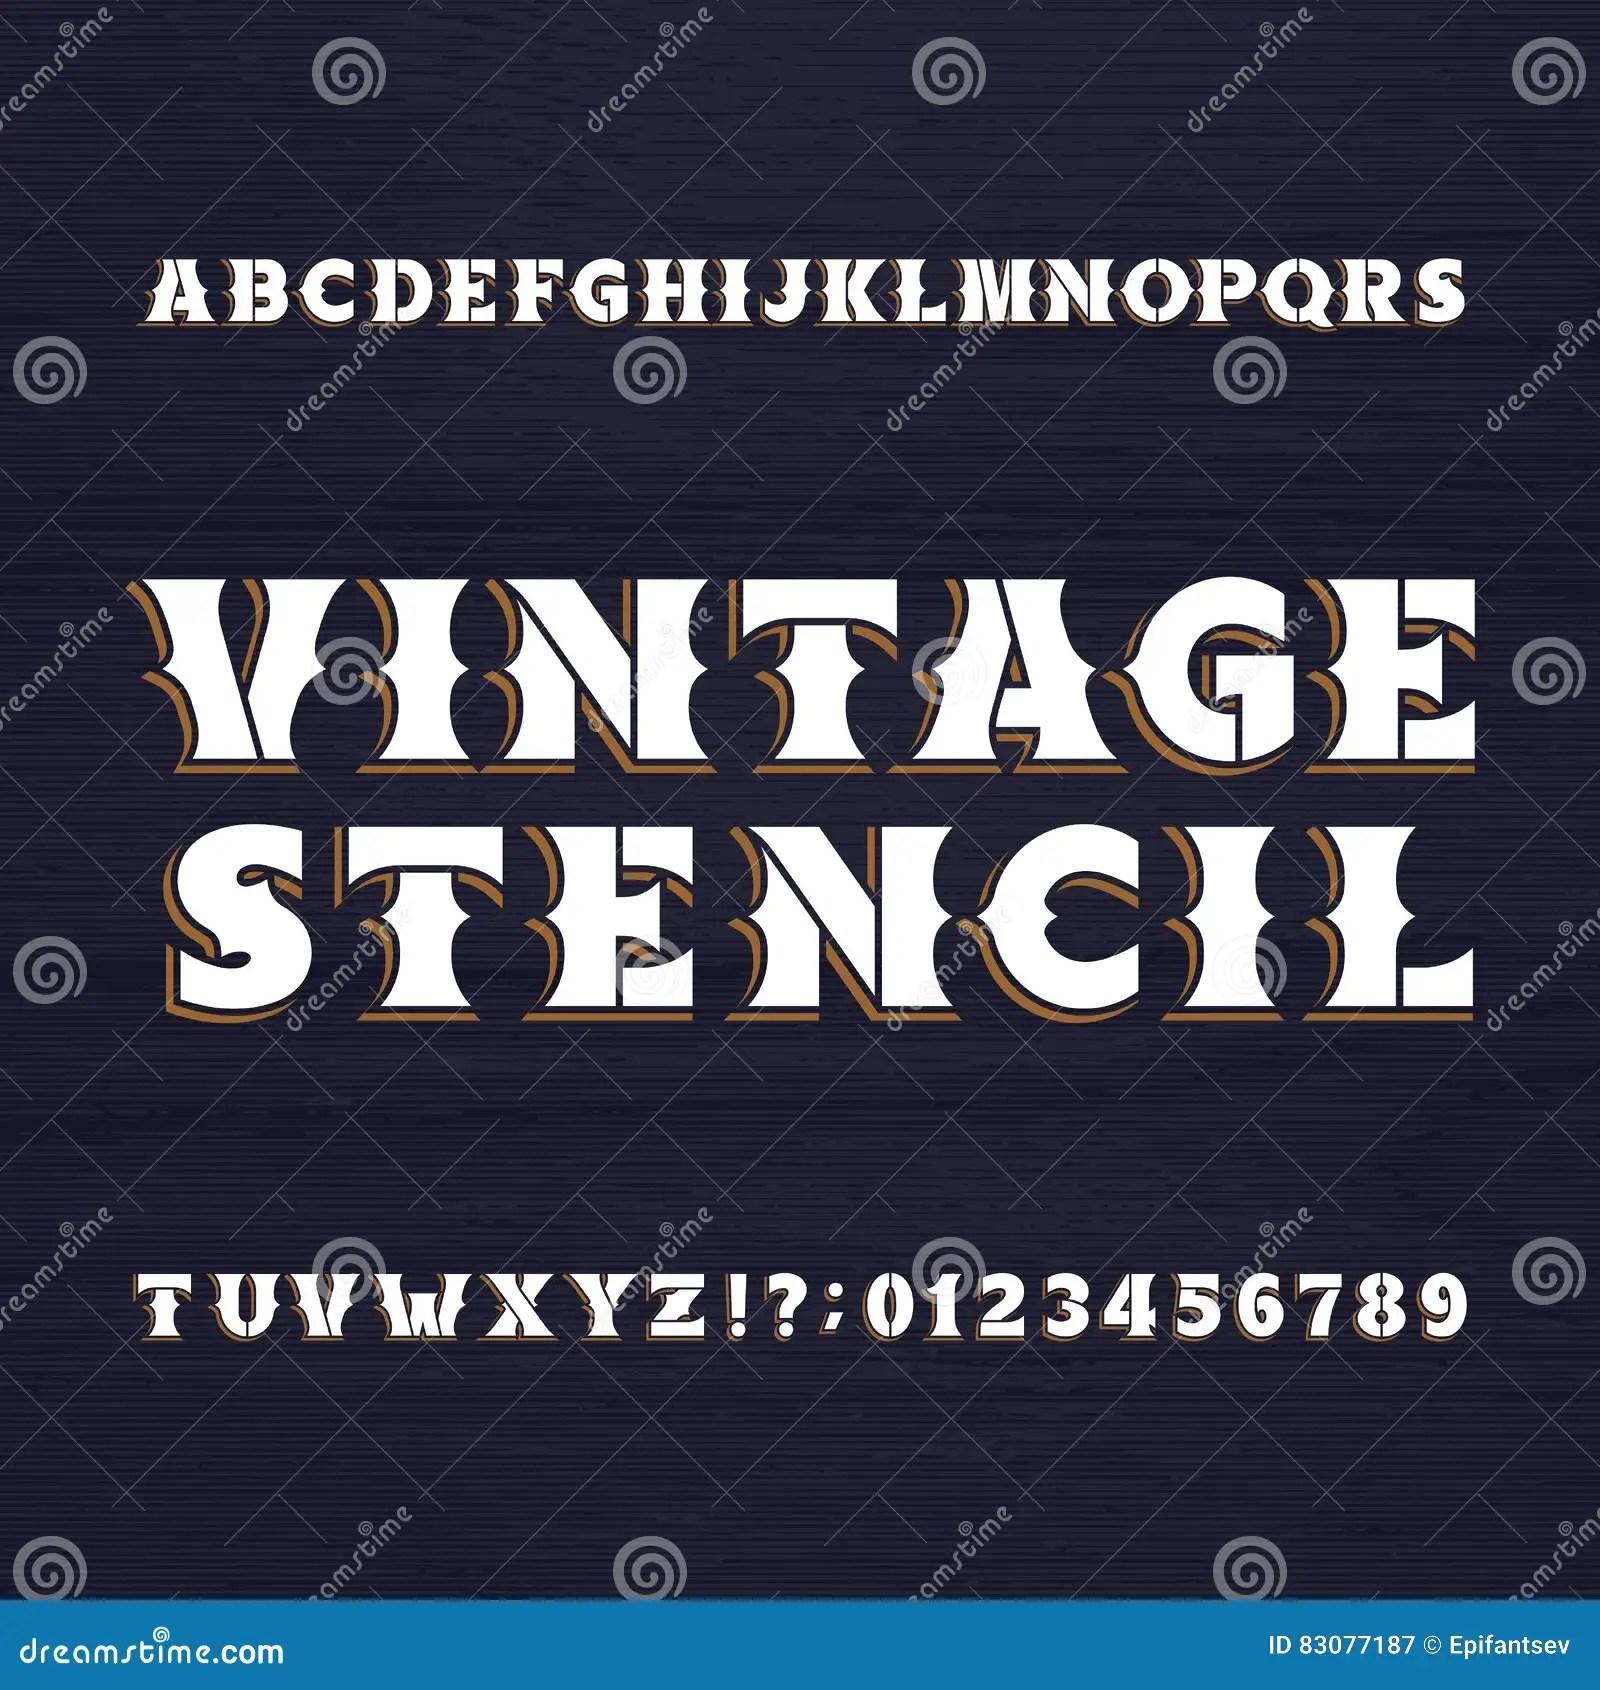 Vintage Stencil Typeface Retro Alphabet Font On A Wooden